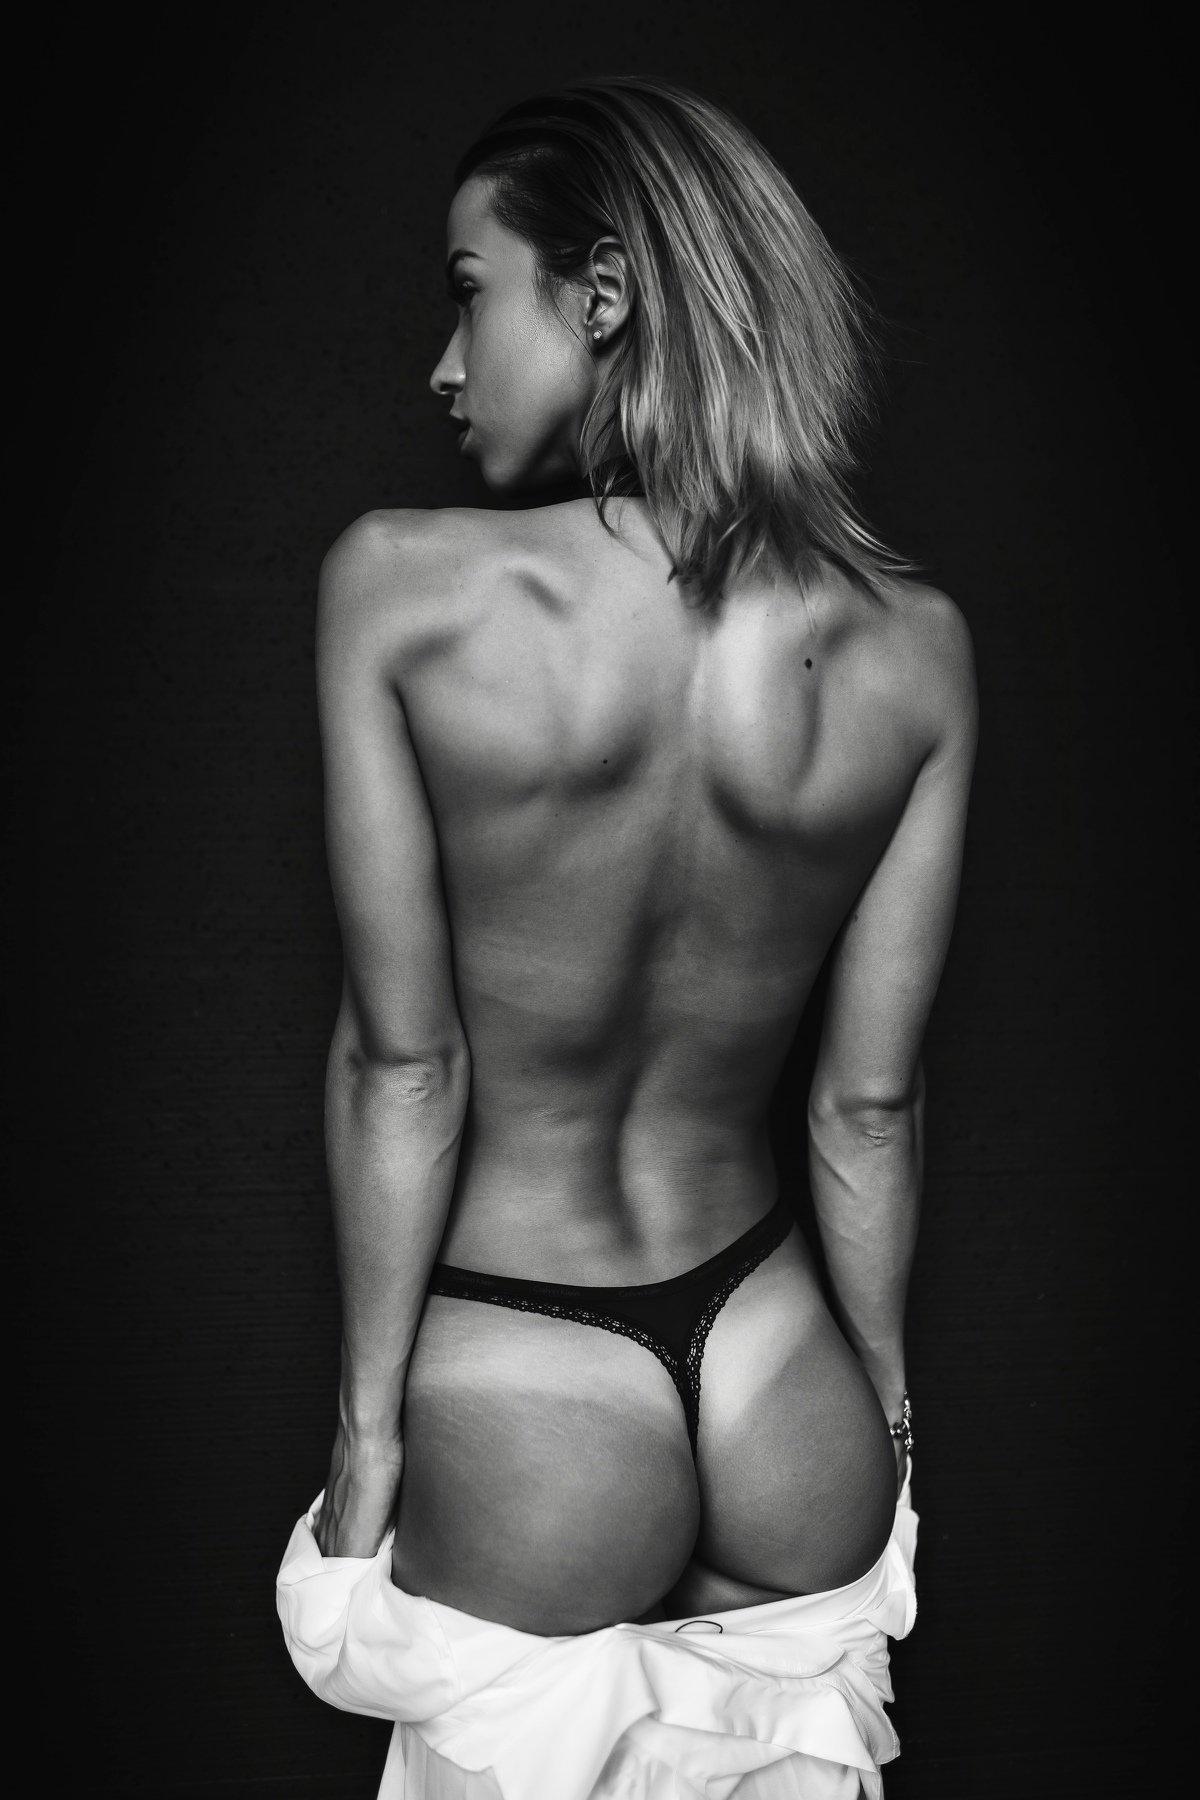 nude girl russian studio light topless, Пистолетов Илья